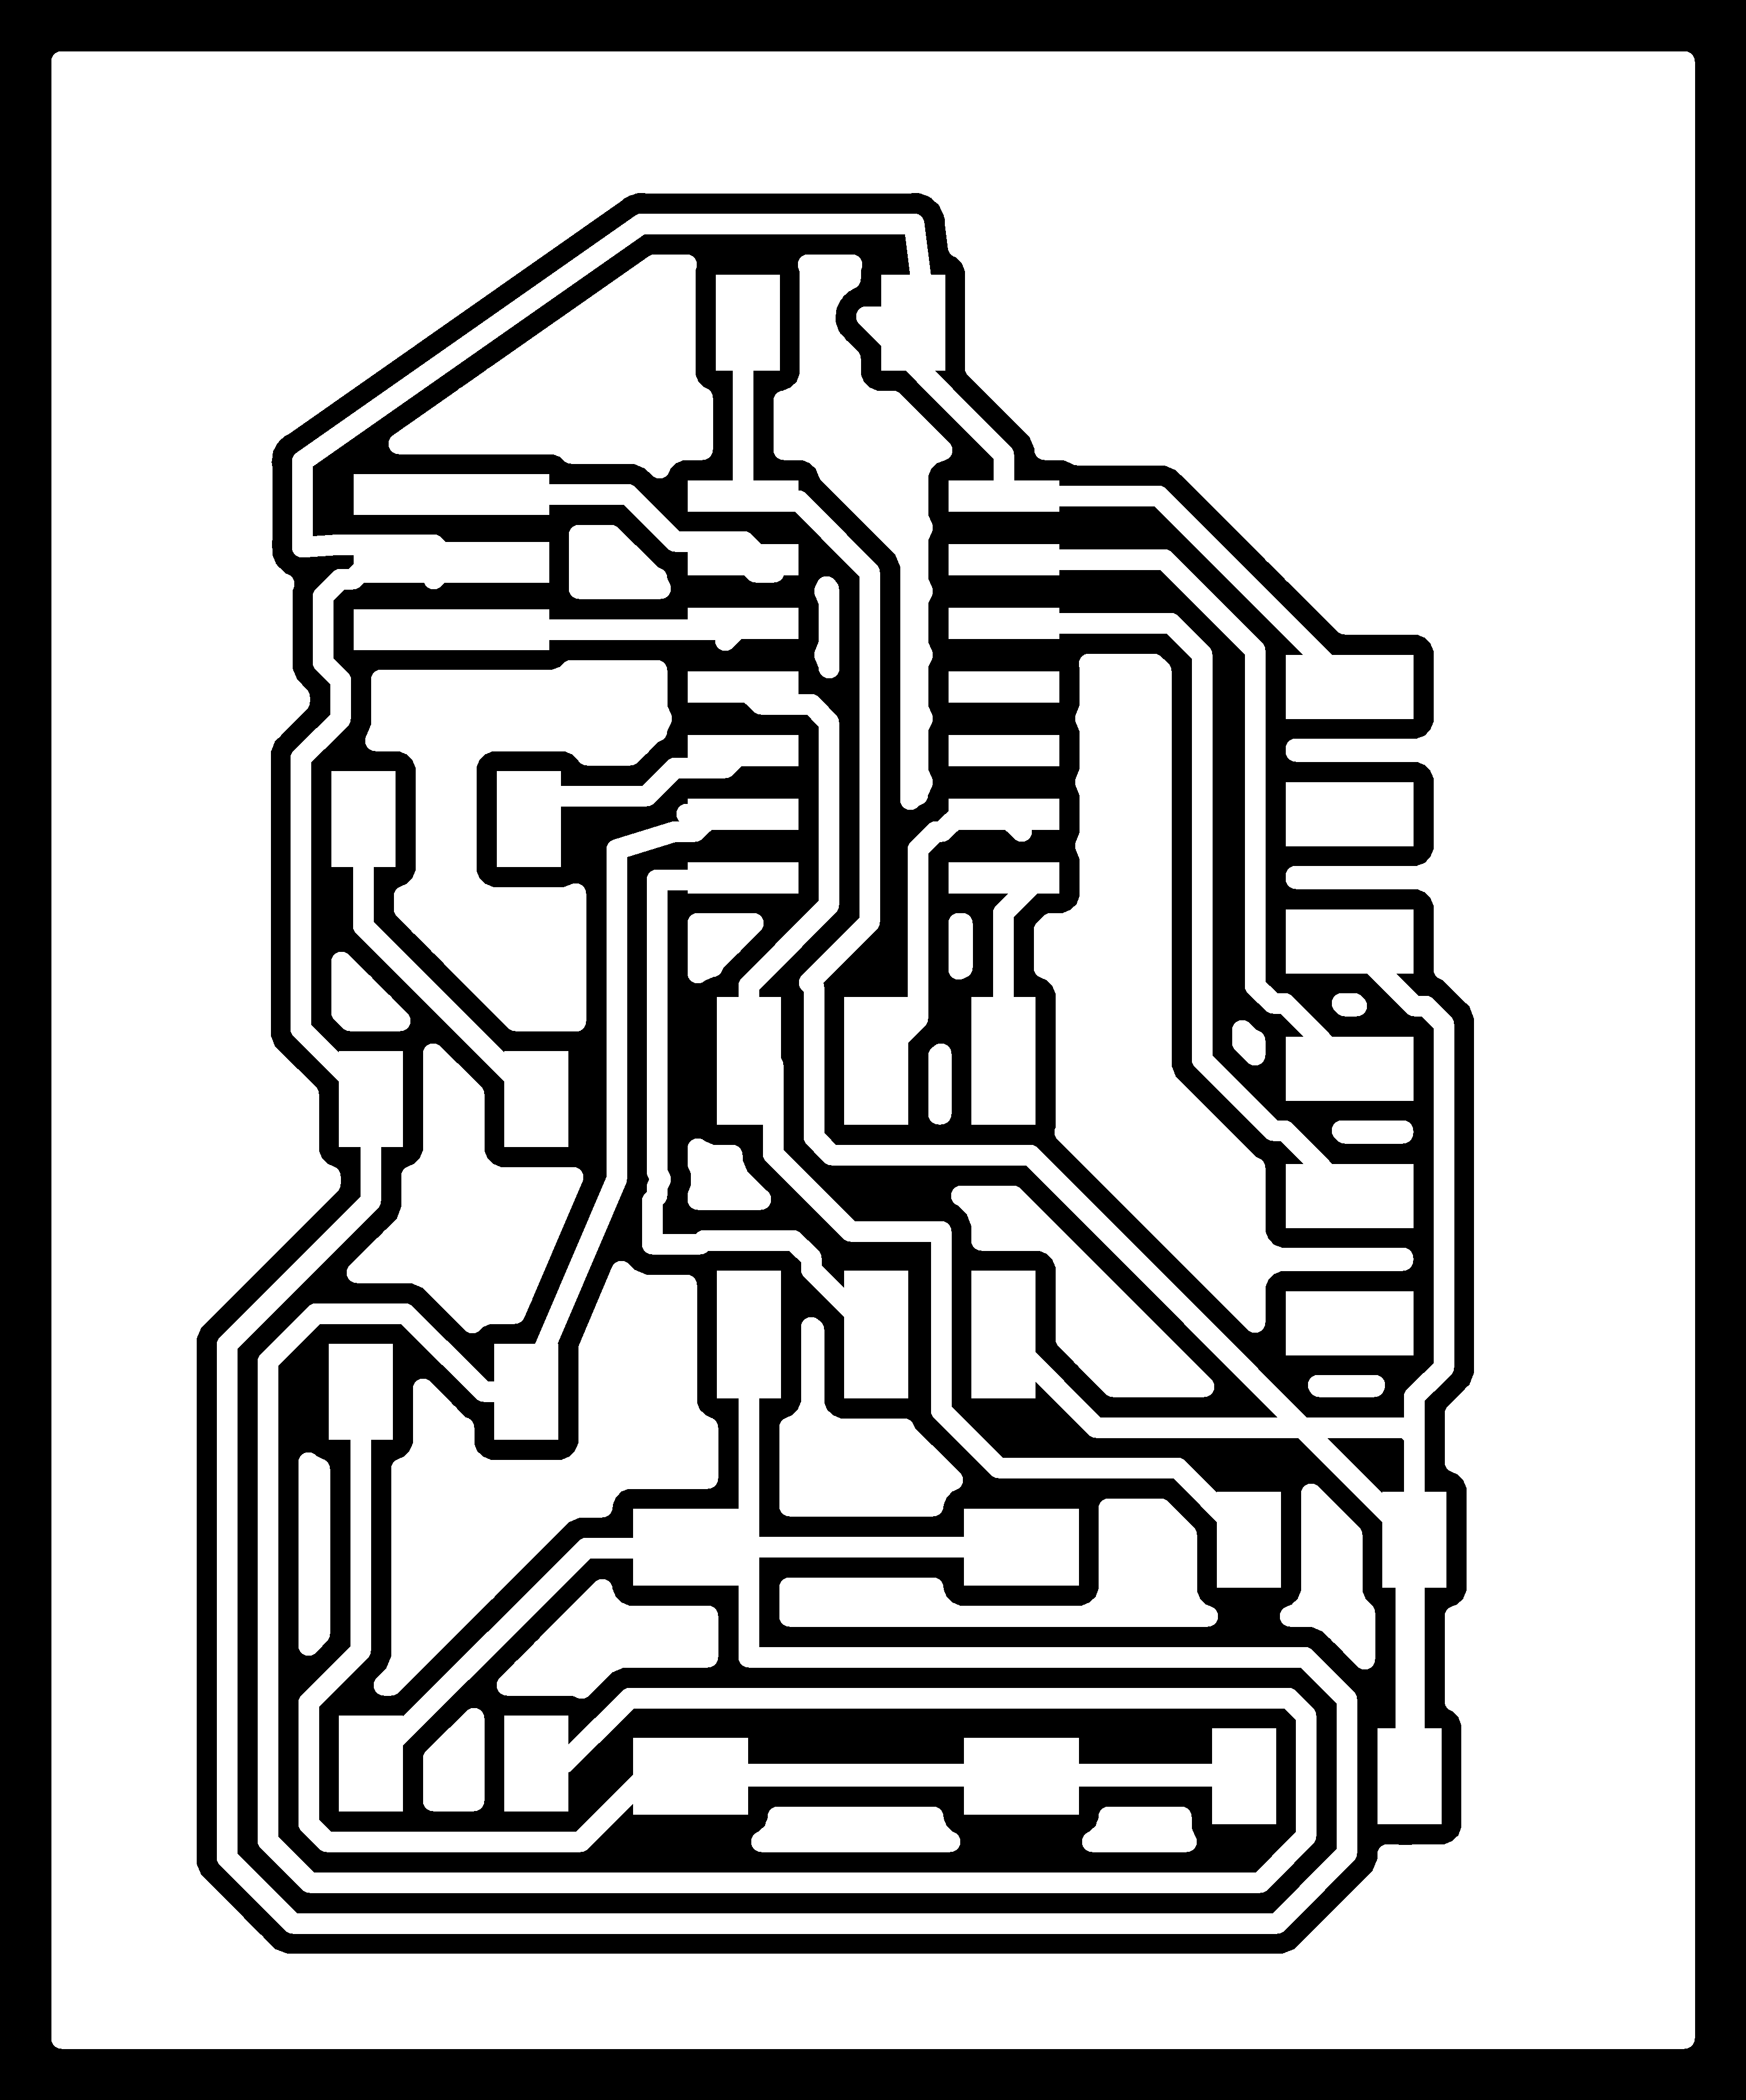 week 7  electronics design